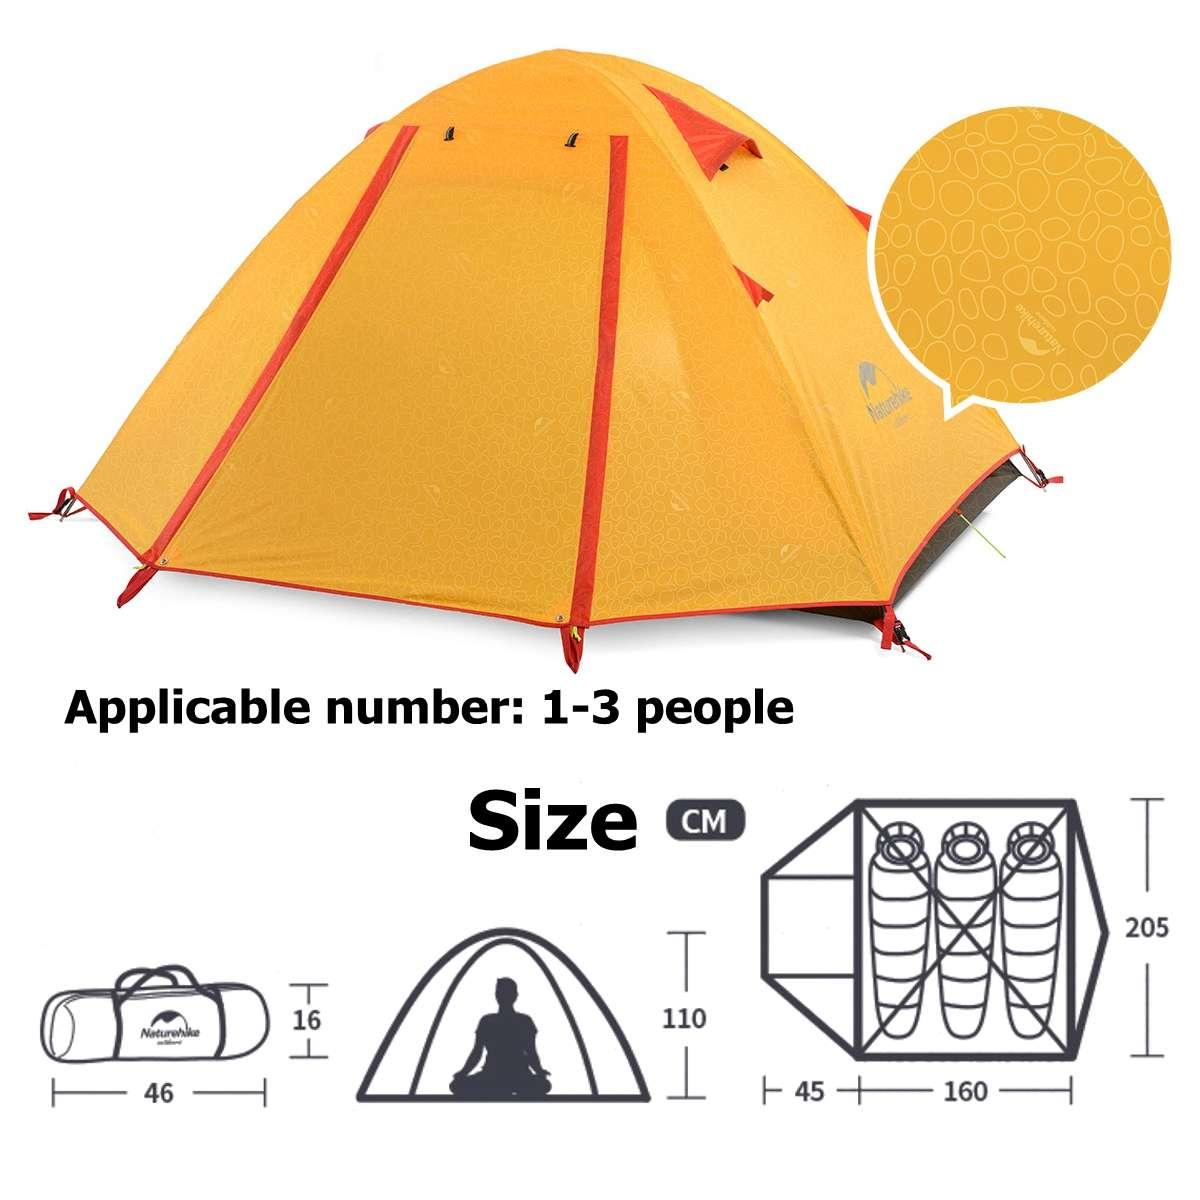 Pole Outdoor Tent Camping UPF50 Naturehike NH Double Aluminum  Anti-UV PU2000 Waterproof 3 PeoplePole Outdoor Tent Camping UPF50 Naturehike NH Double Aluminum  Anti-UV PU2000 Waterproof 3 People